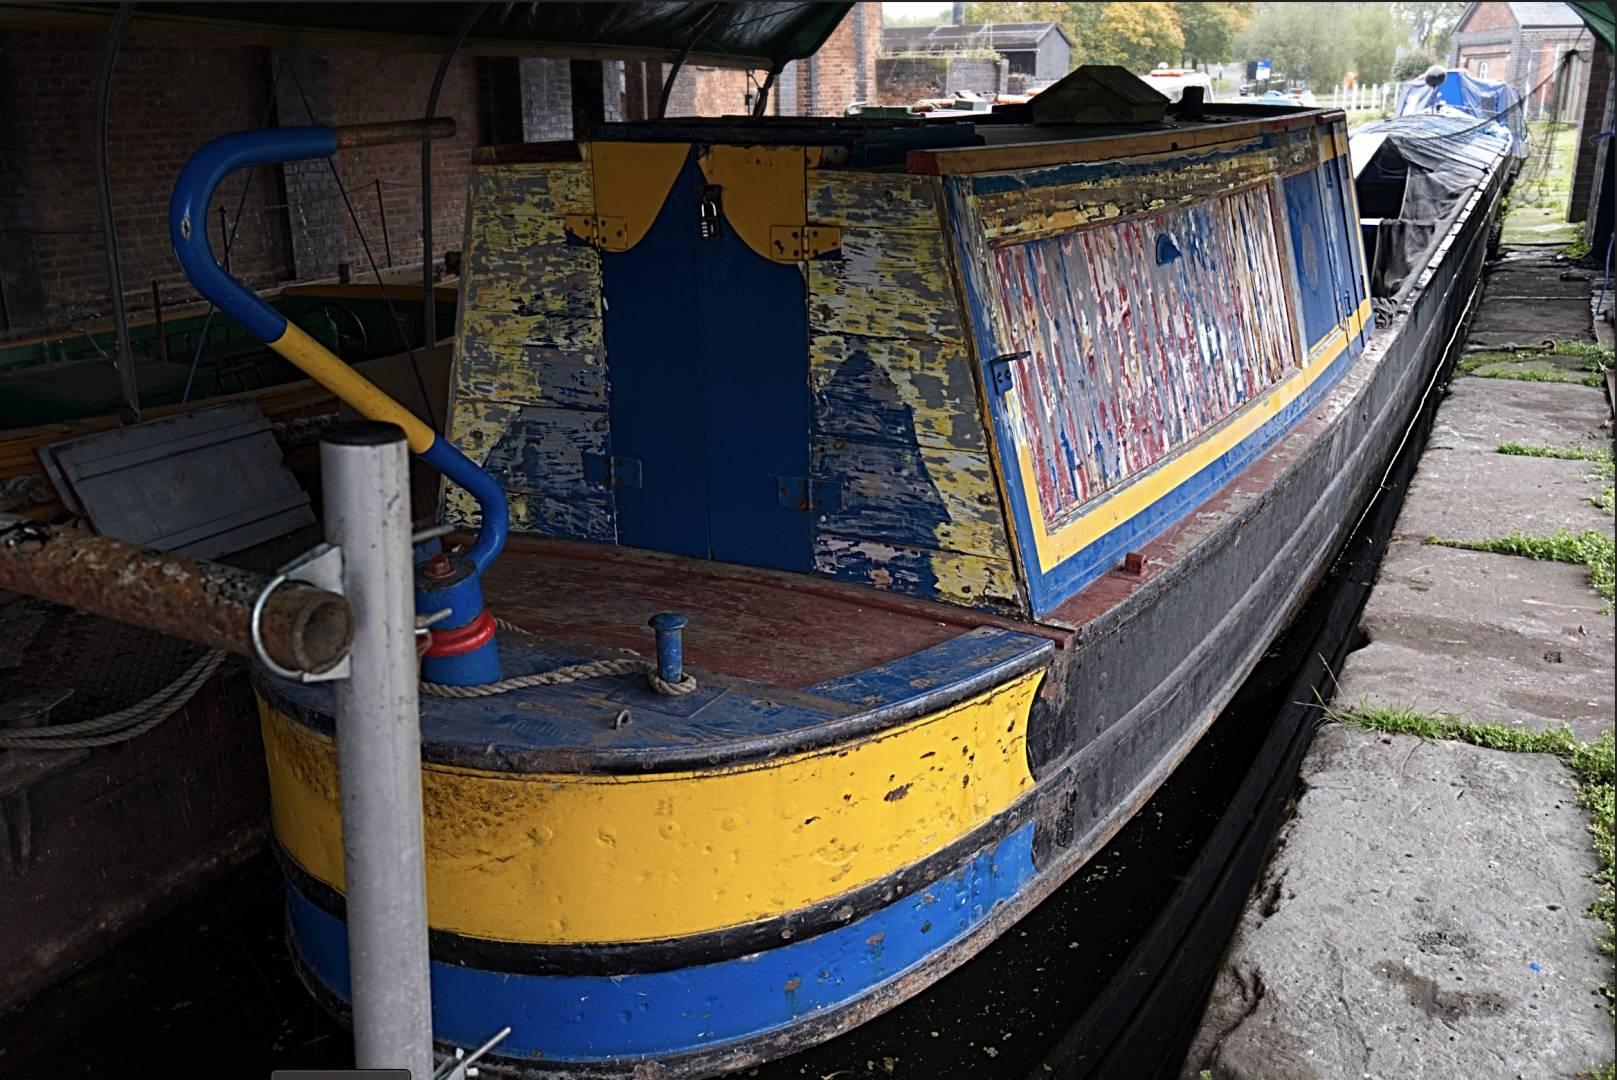 Restoring a Canal Boat  Fuji X-T20 + 10 - 24 f/4